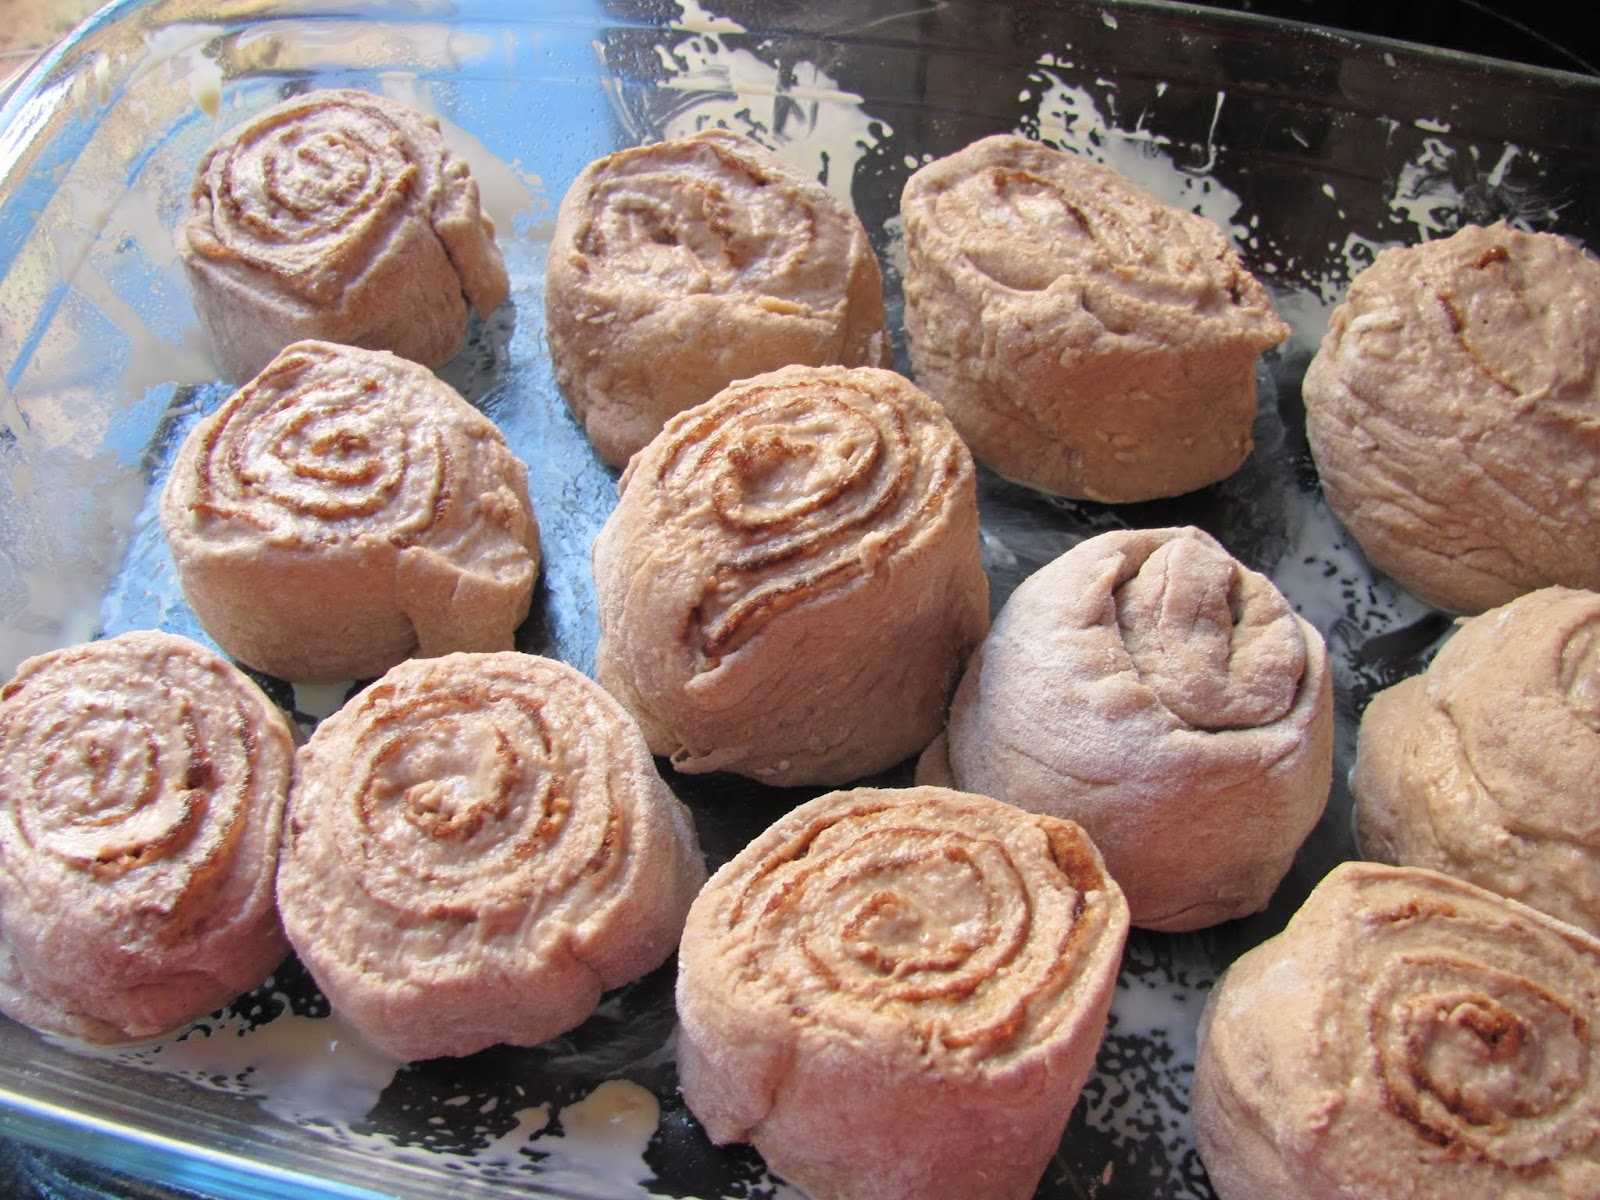 Arranging Cinnamon Rolls